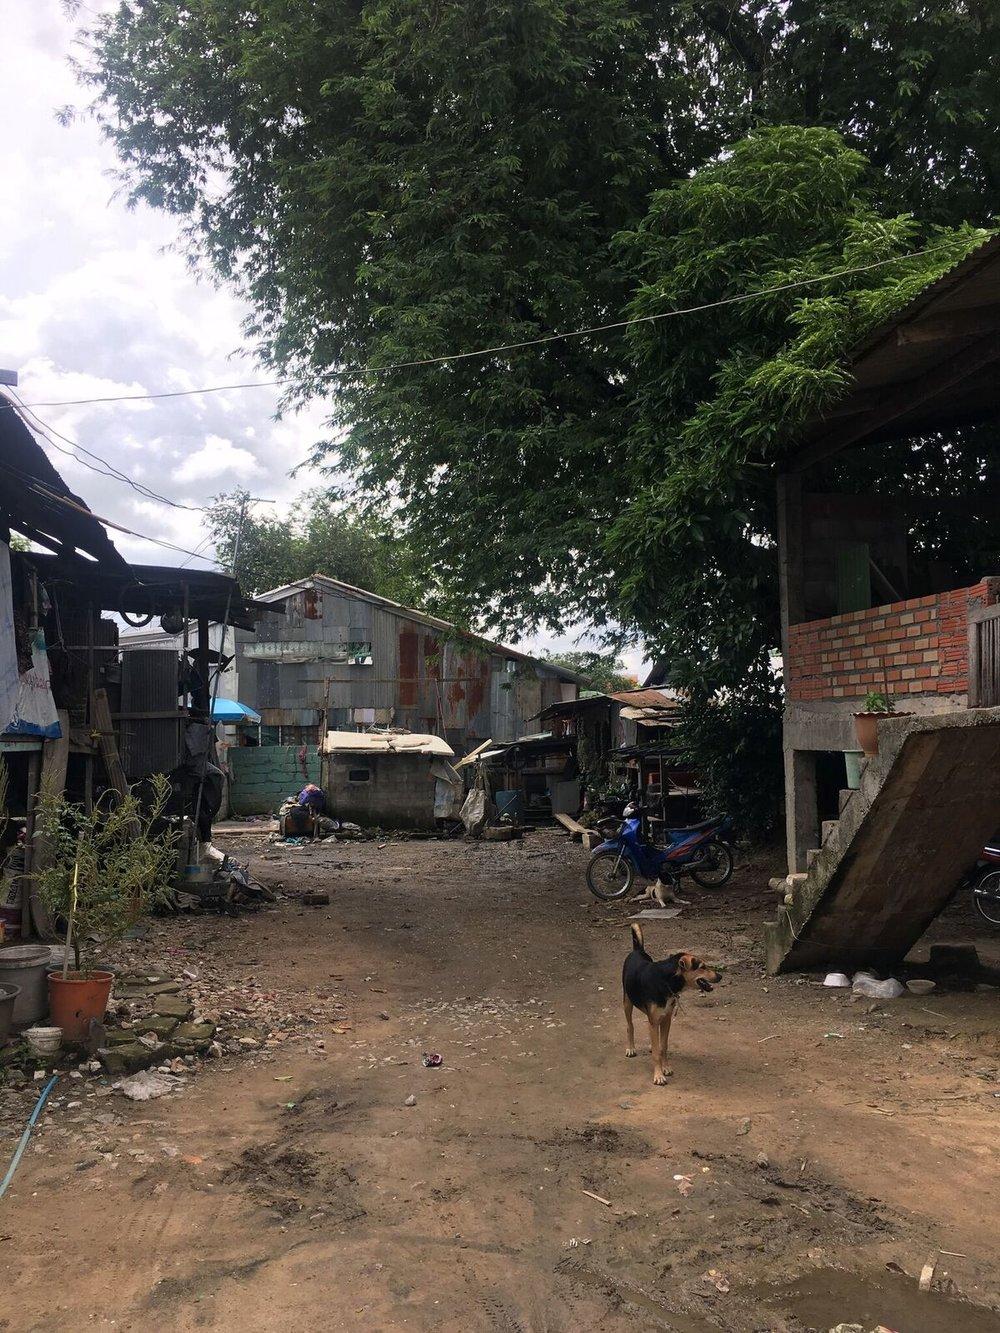 Chan Viroj railway community still experiences severe flooding (Photo by Carl Middleton)